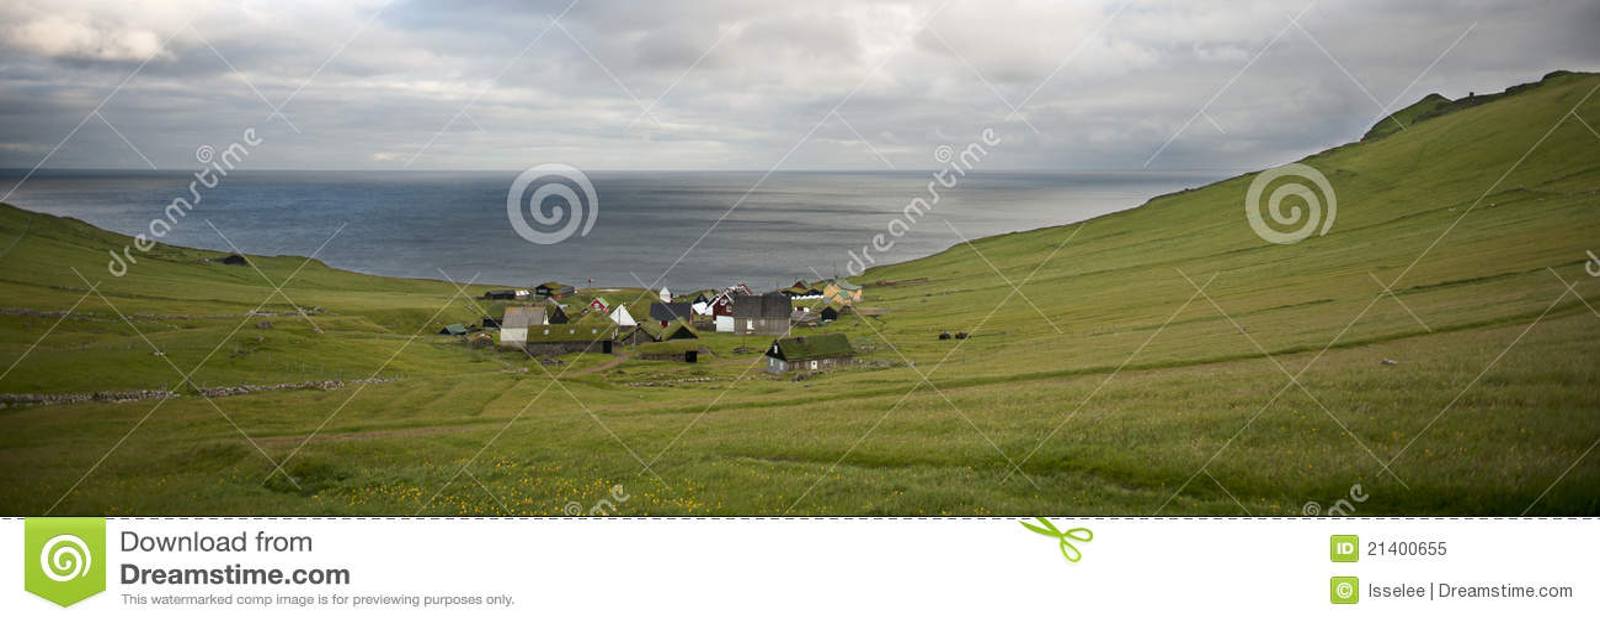 Dorf der Insel Mykines